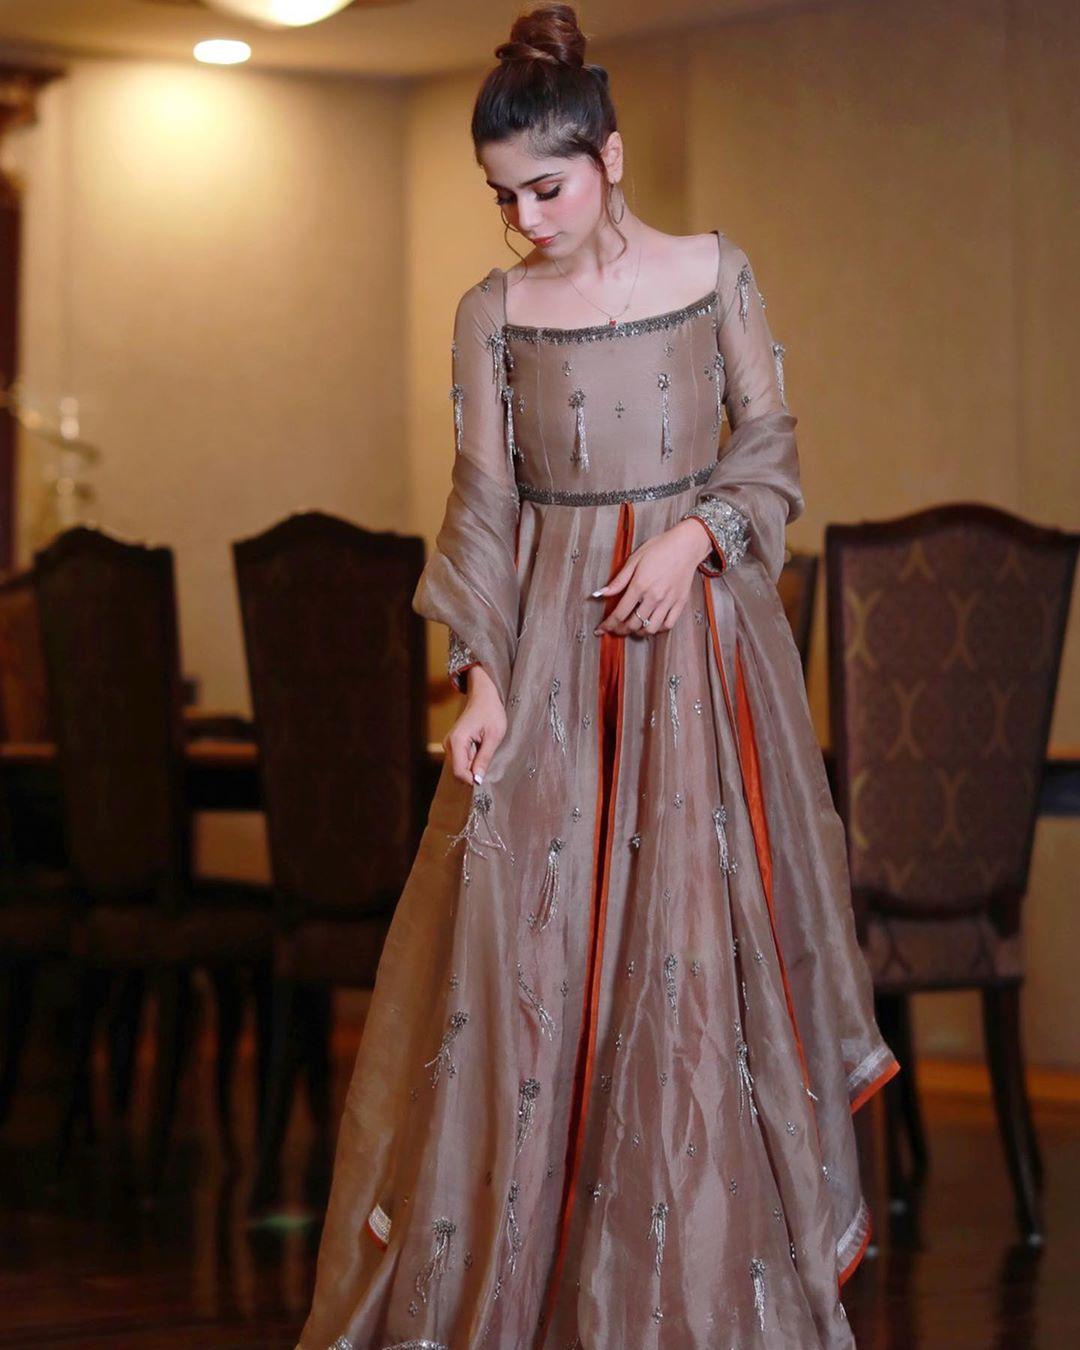 Aima Baig Looks Gorgeous in New Dress